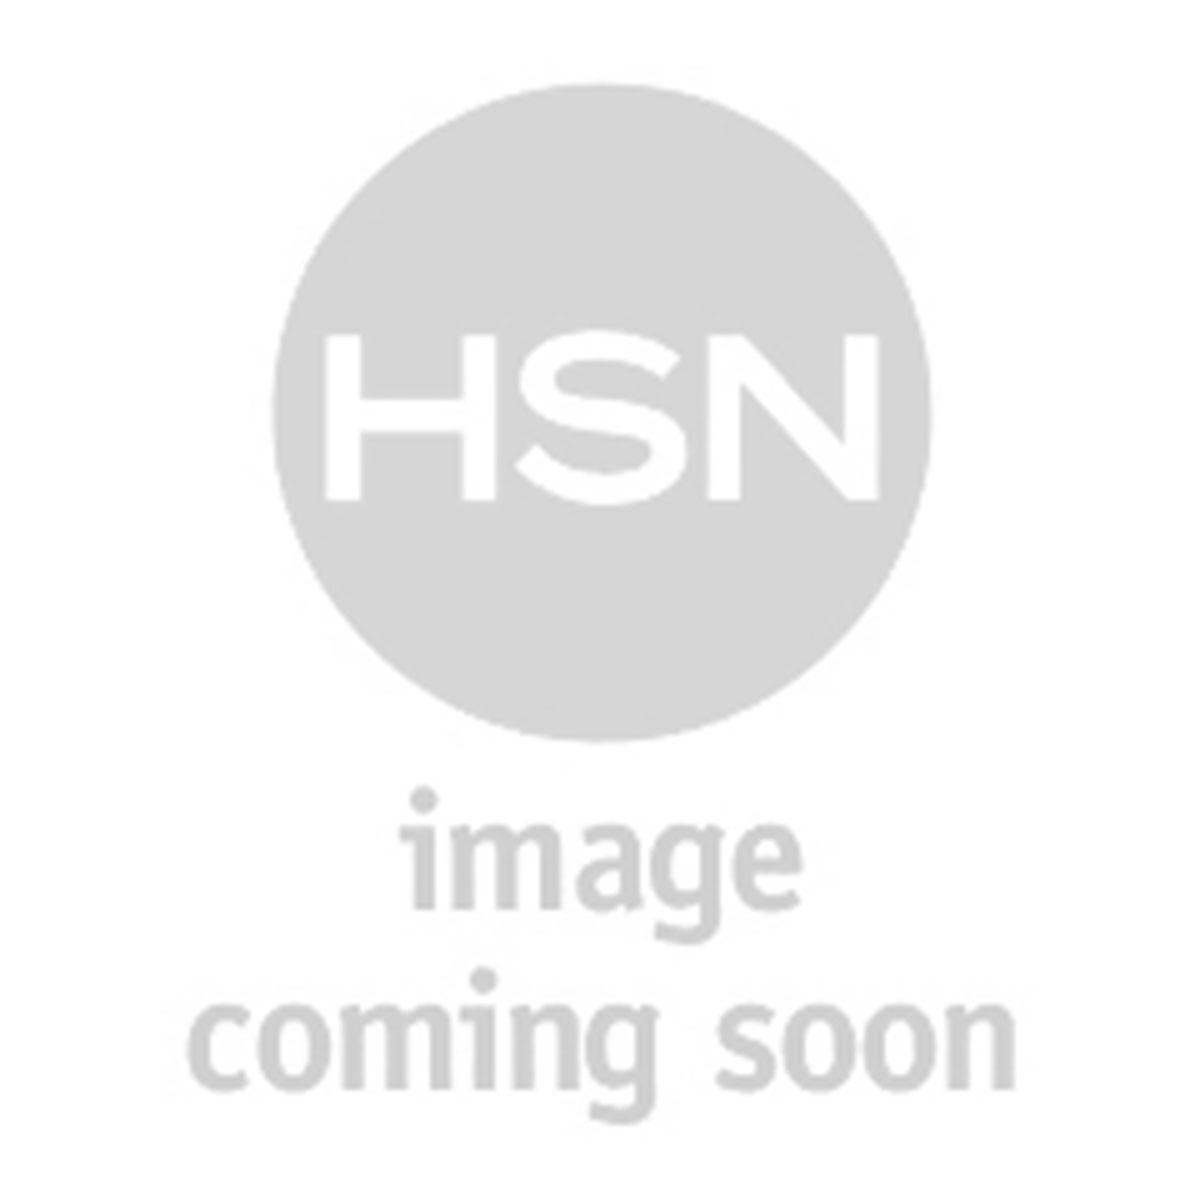 safavieh colin tufted club chair conant ball wishbone wood - 6439817   hsn